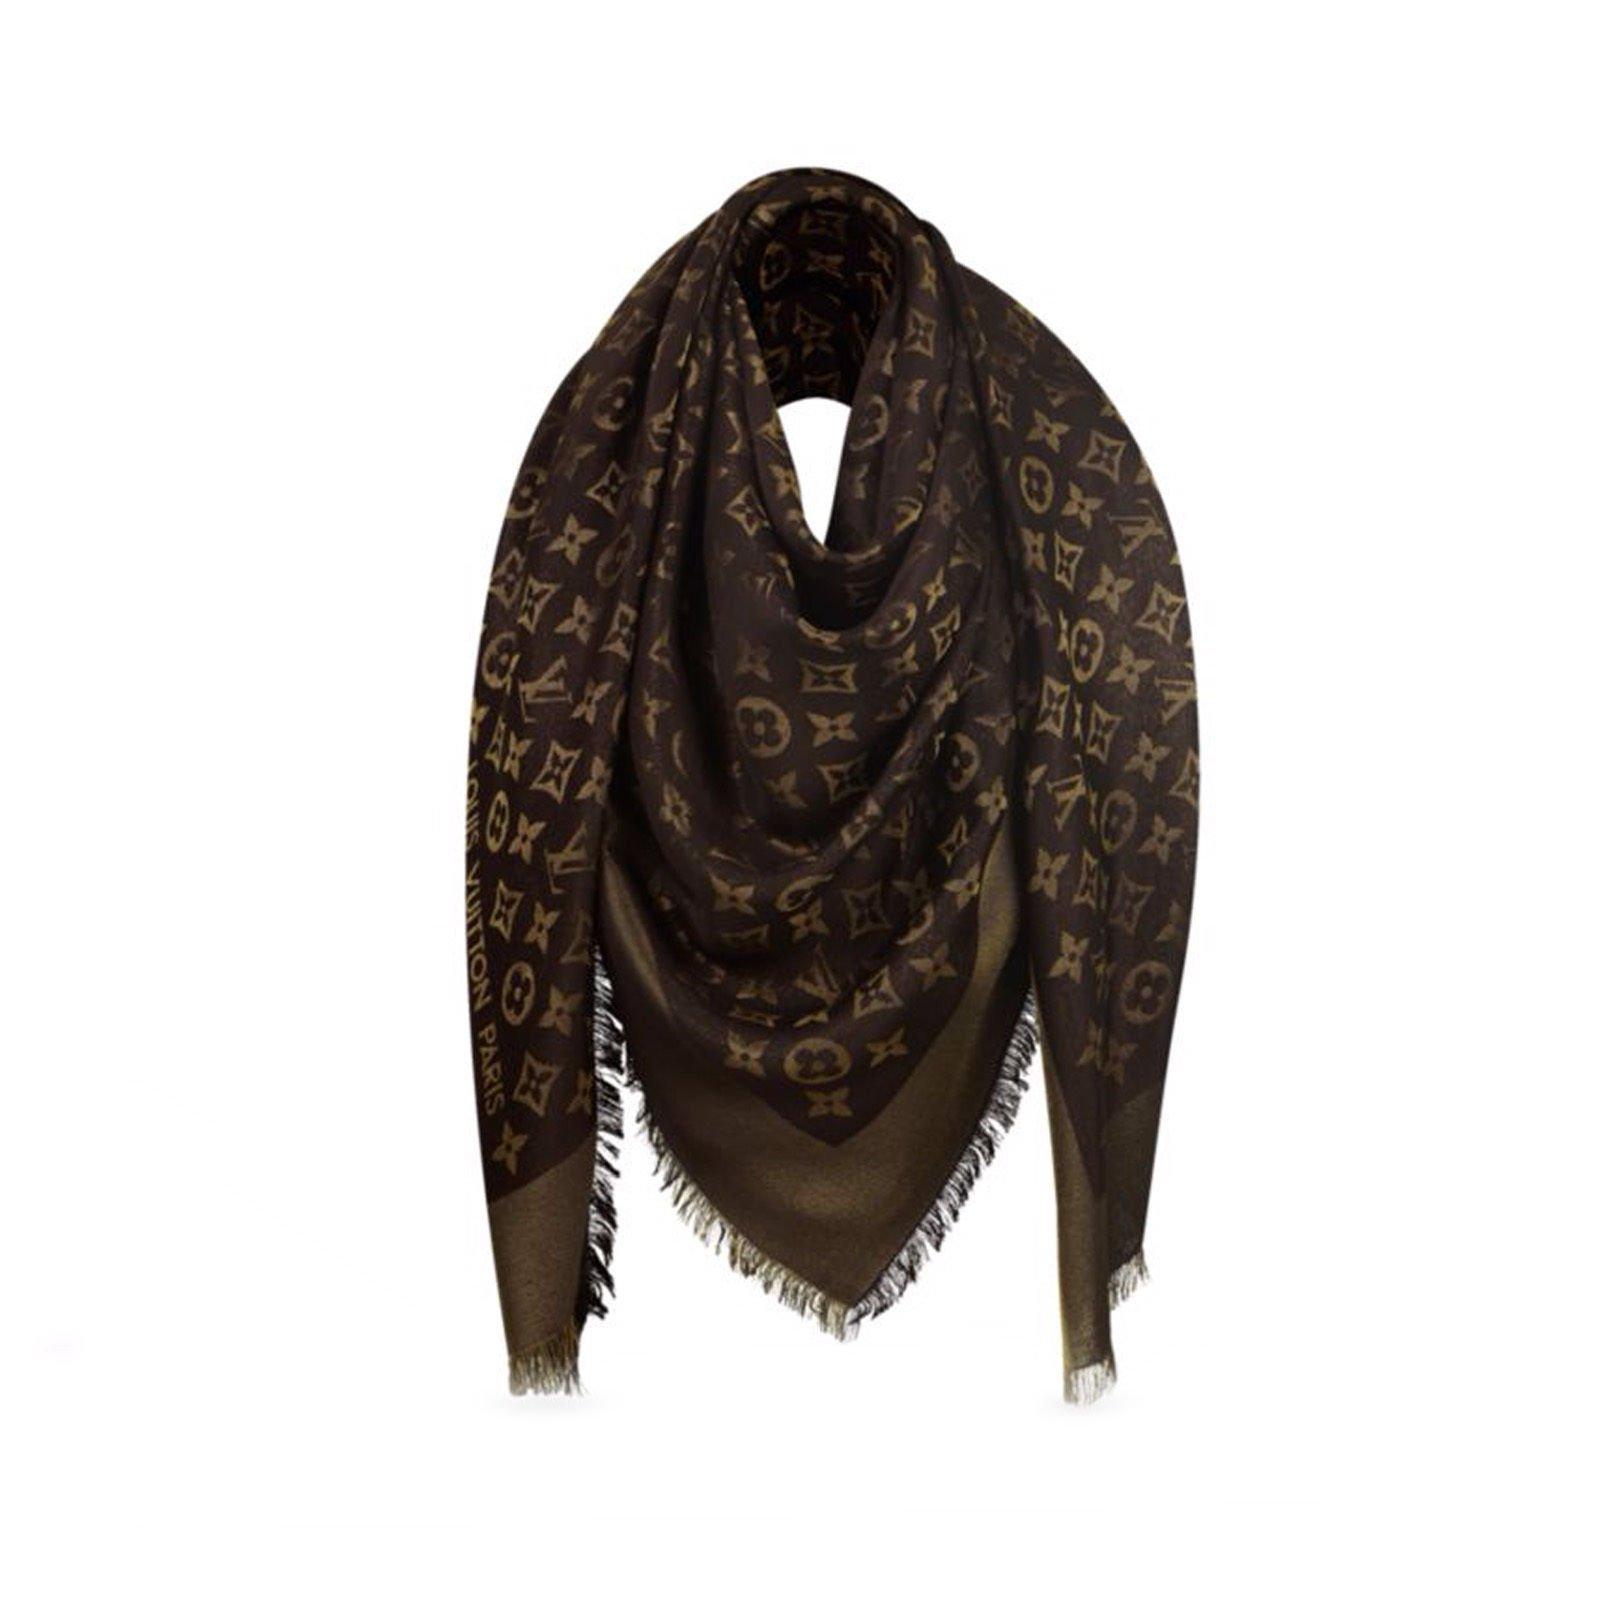 2f2a217ec49b Louis Vuitton Classical Monogram Scarf Scarves Silk Brown ref.48416 ...